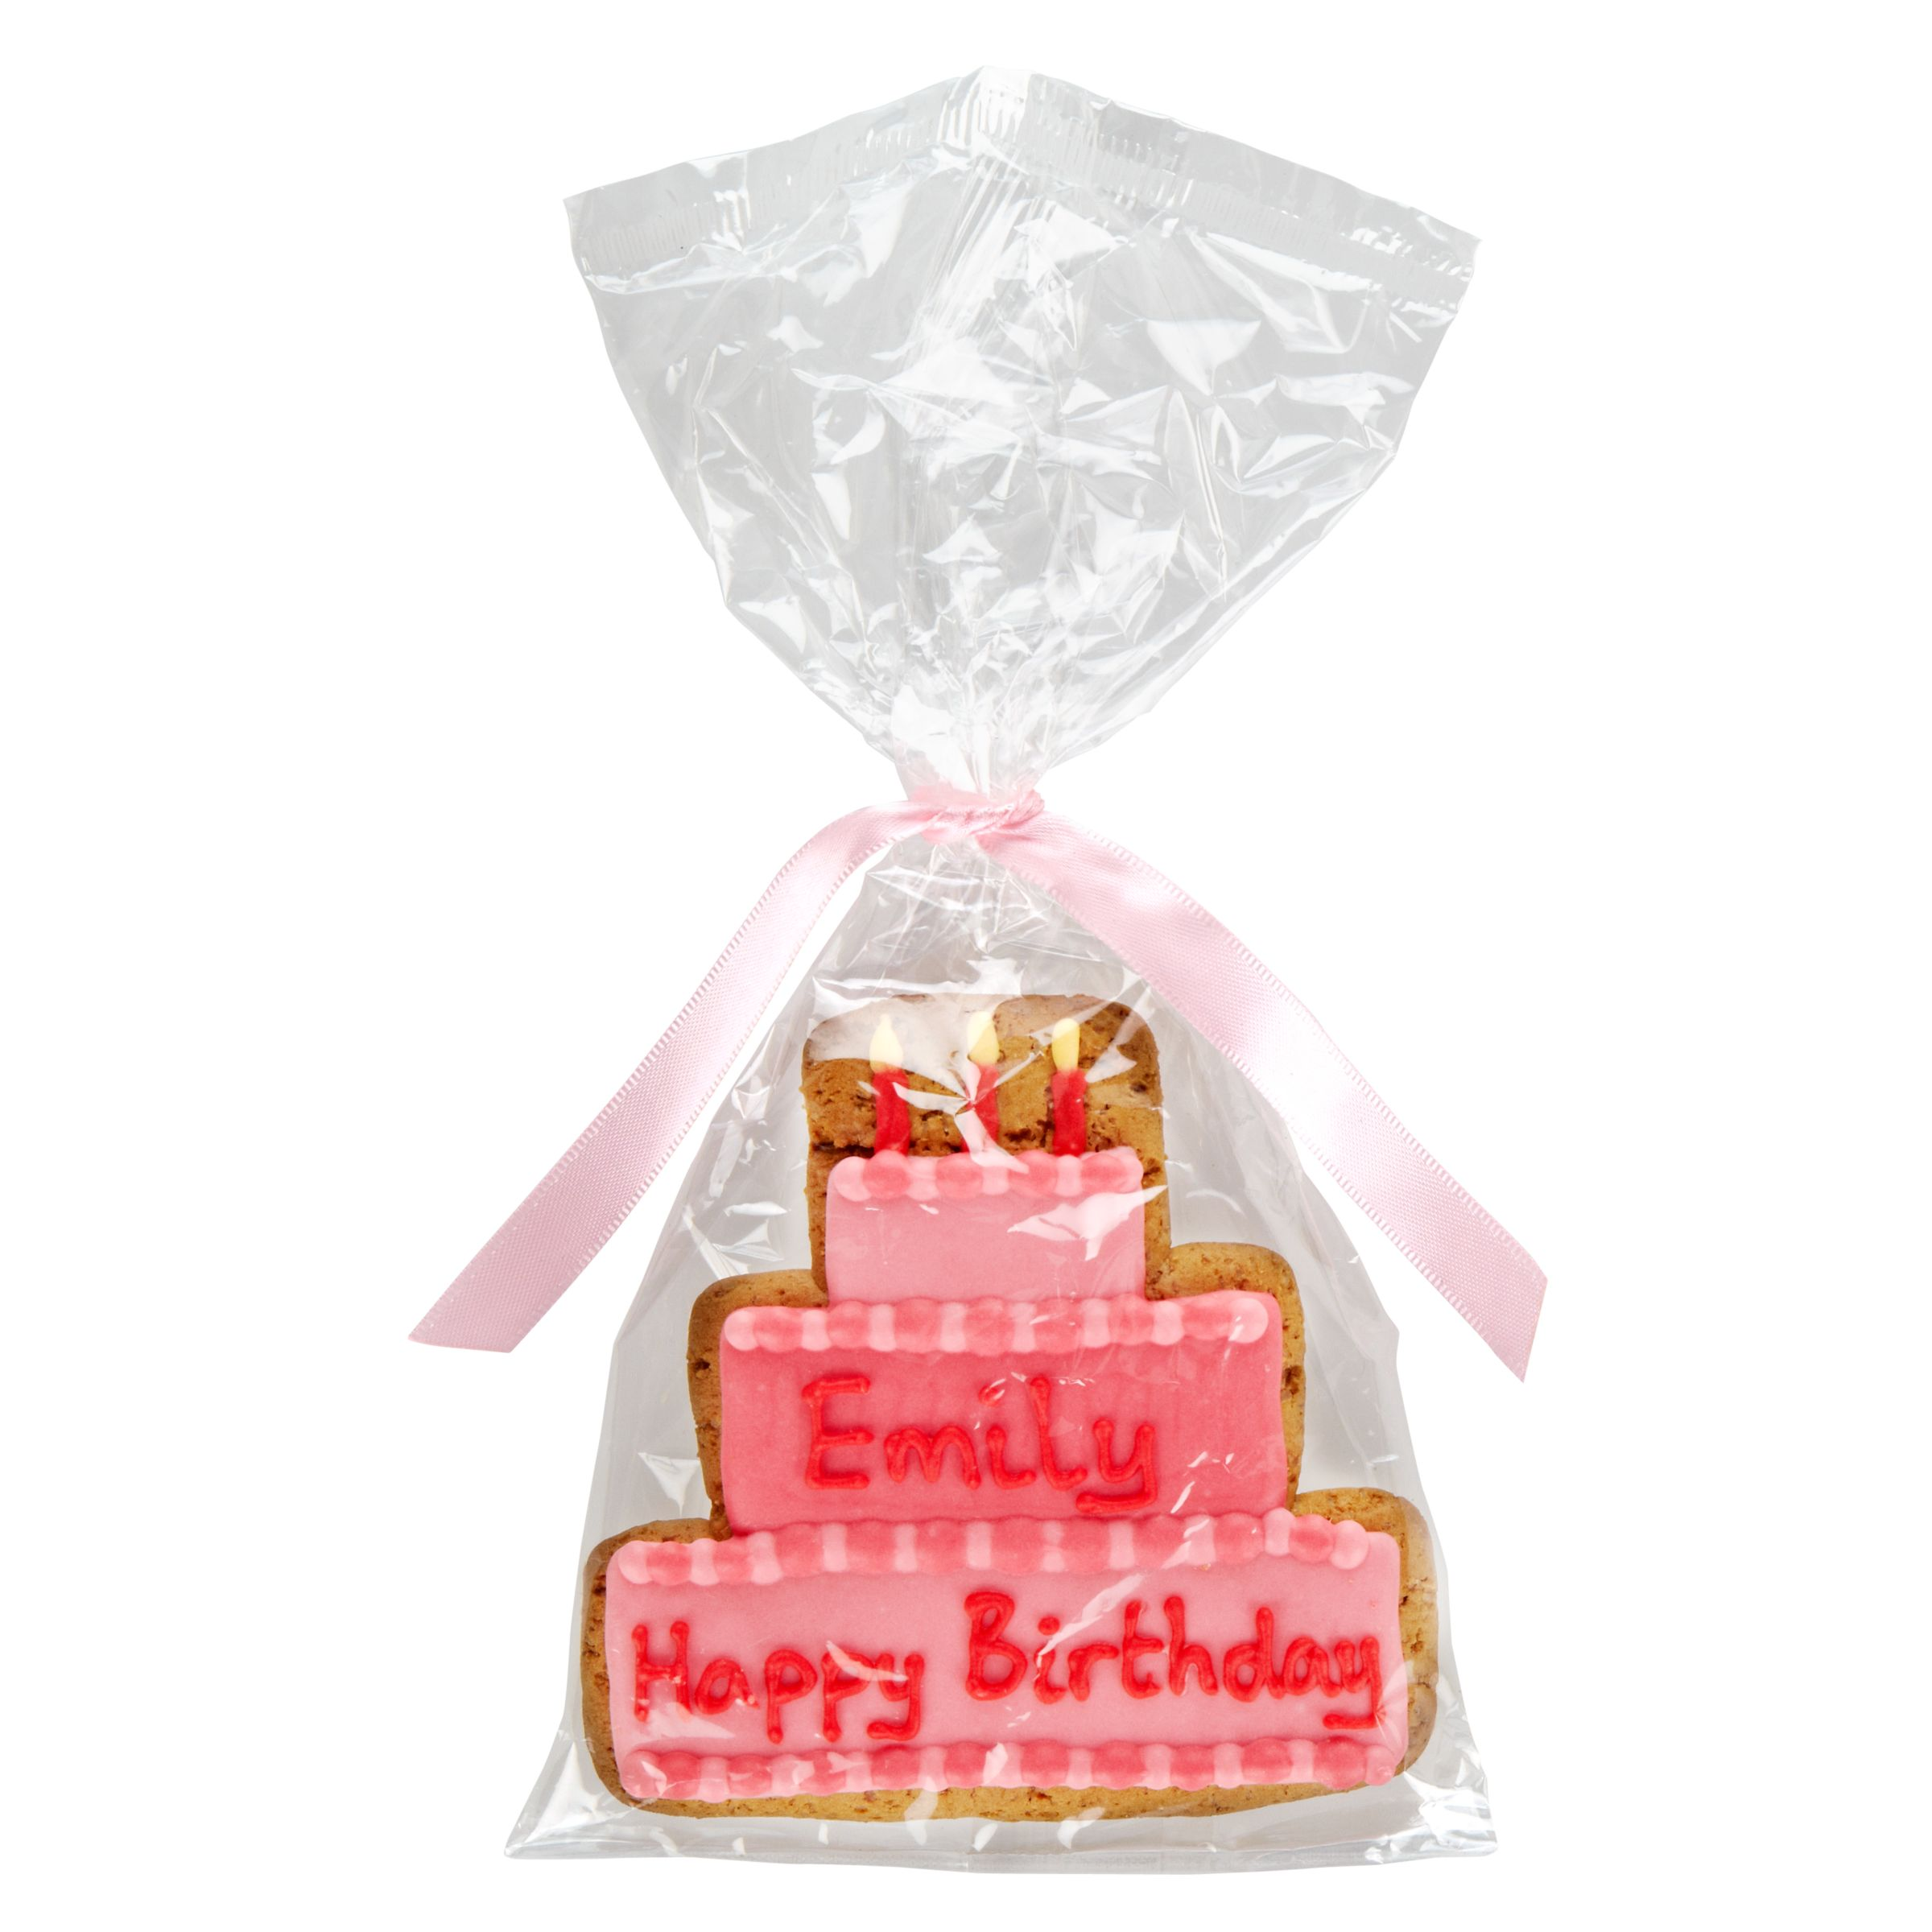 Birthday Cake John Lewis : Buy Image on Food Personalised Happy Birthday Cake Girl ...